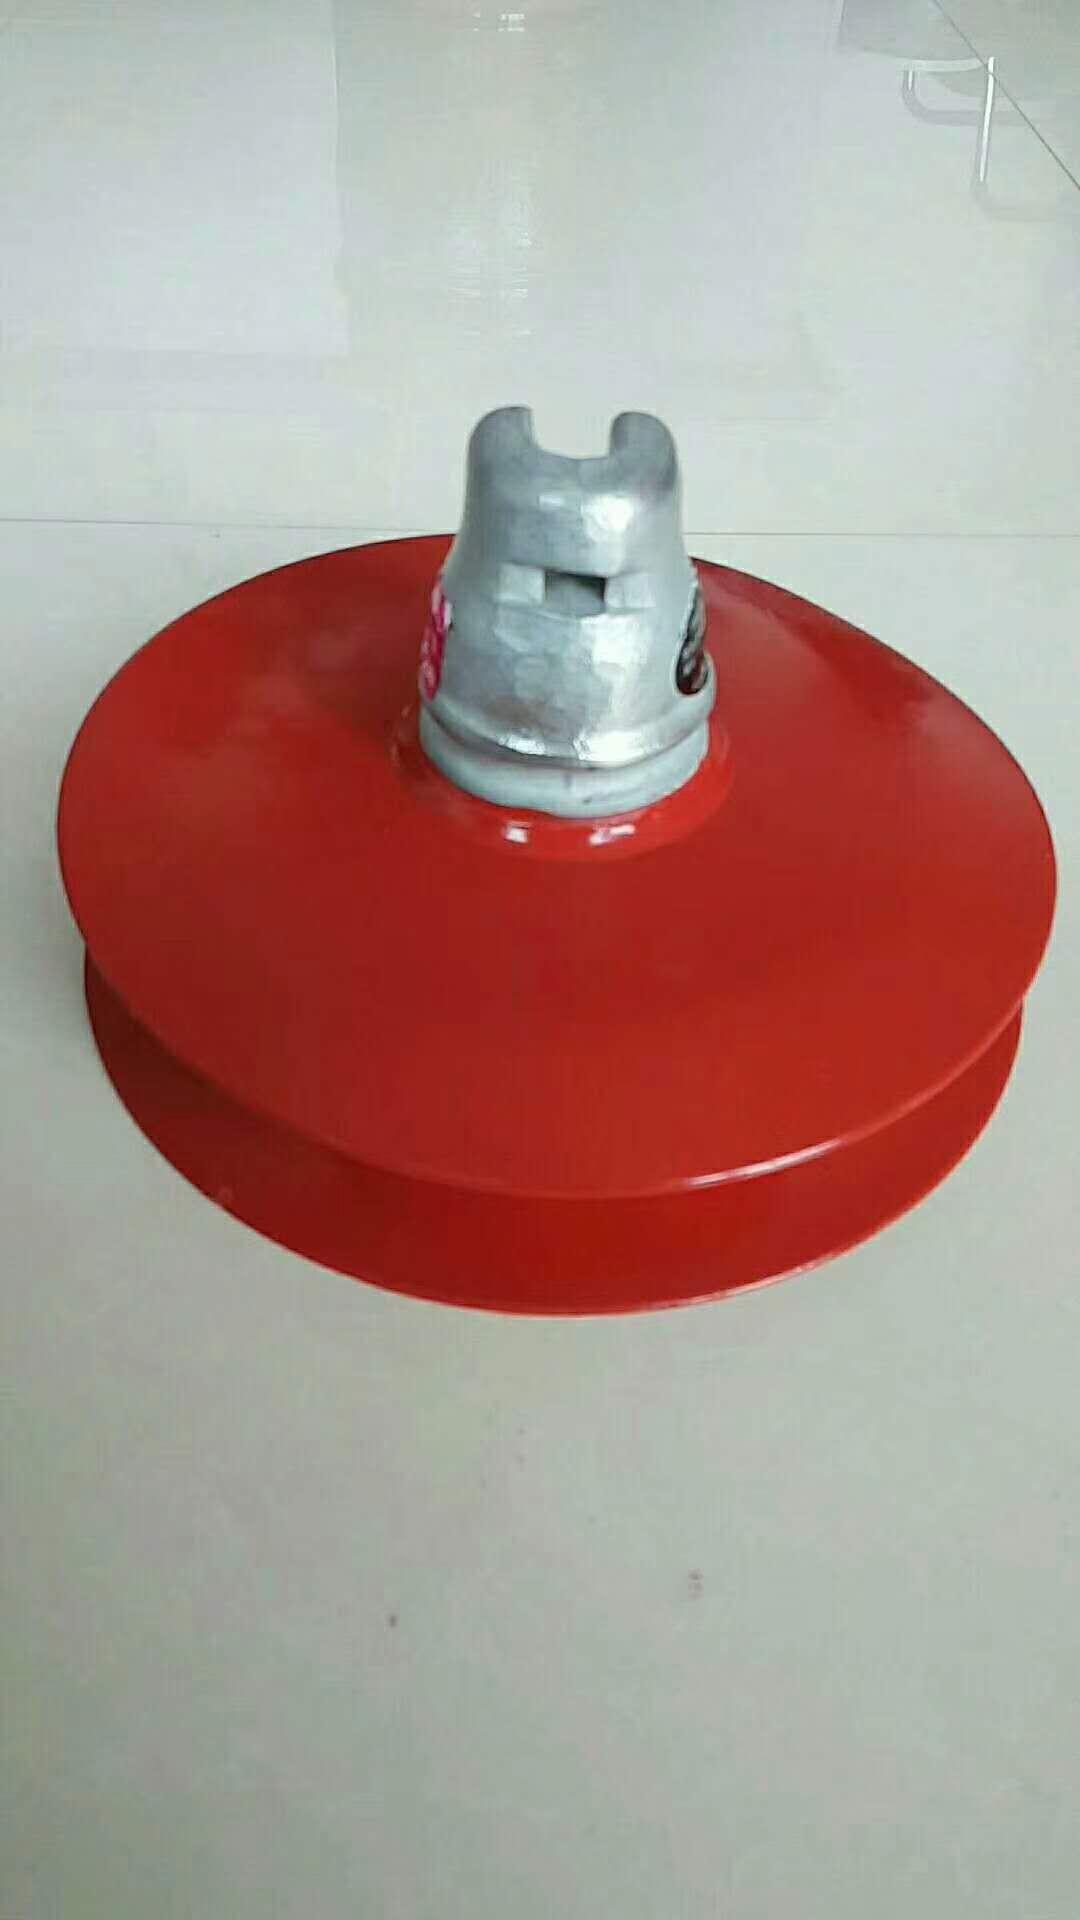 盘形悬式绝缘子FXWP-70 FXWP1-70 FU-70